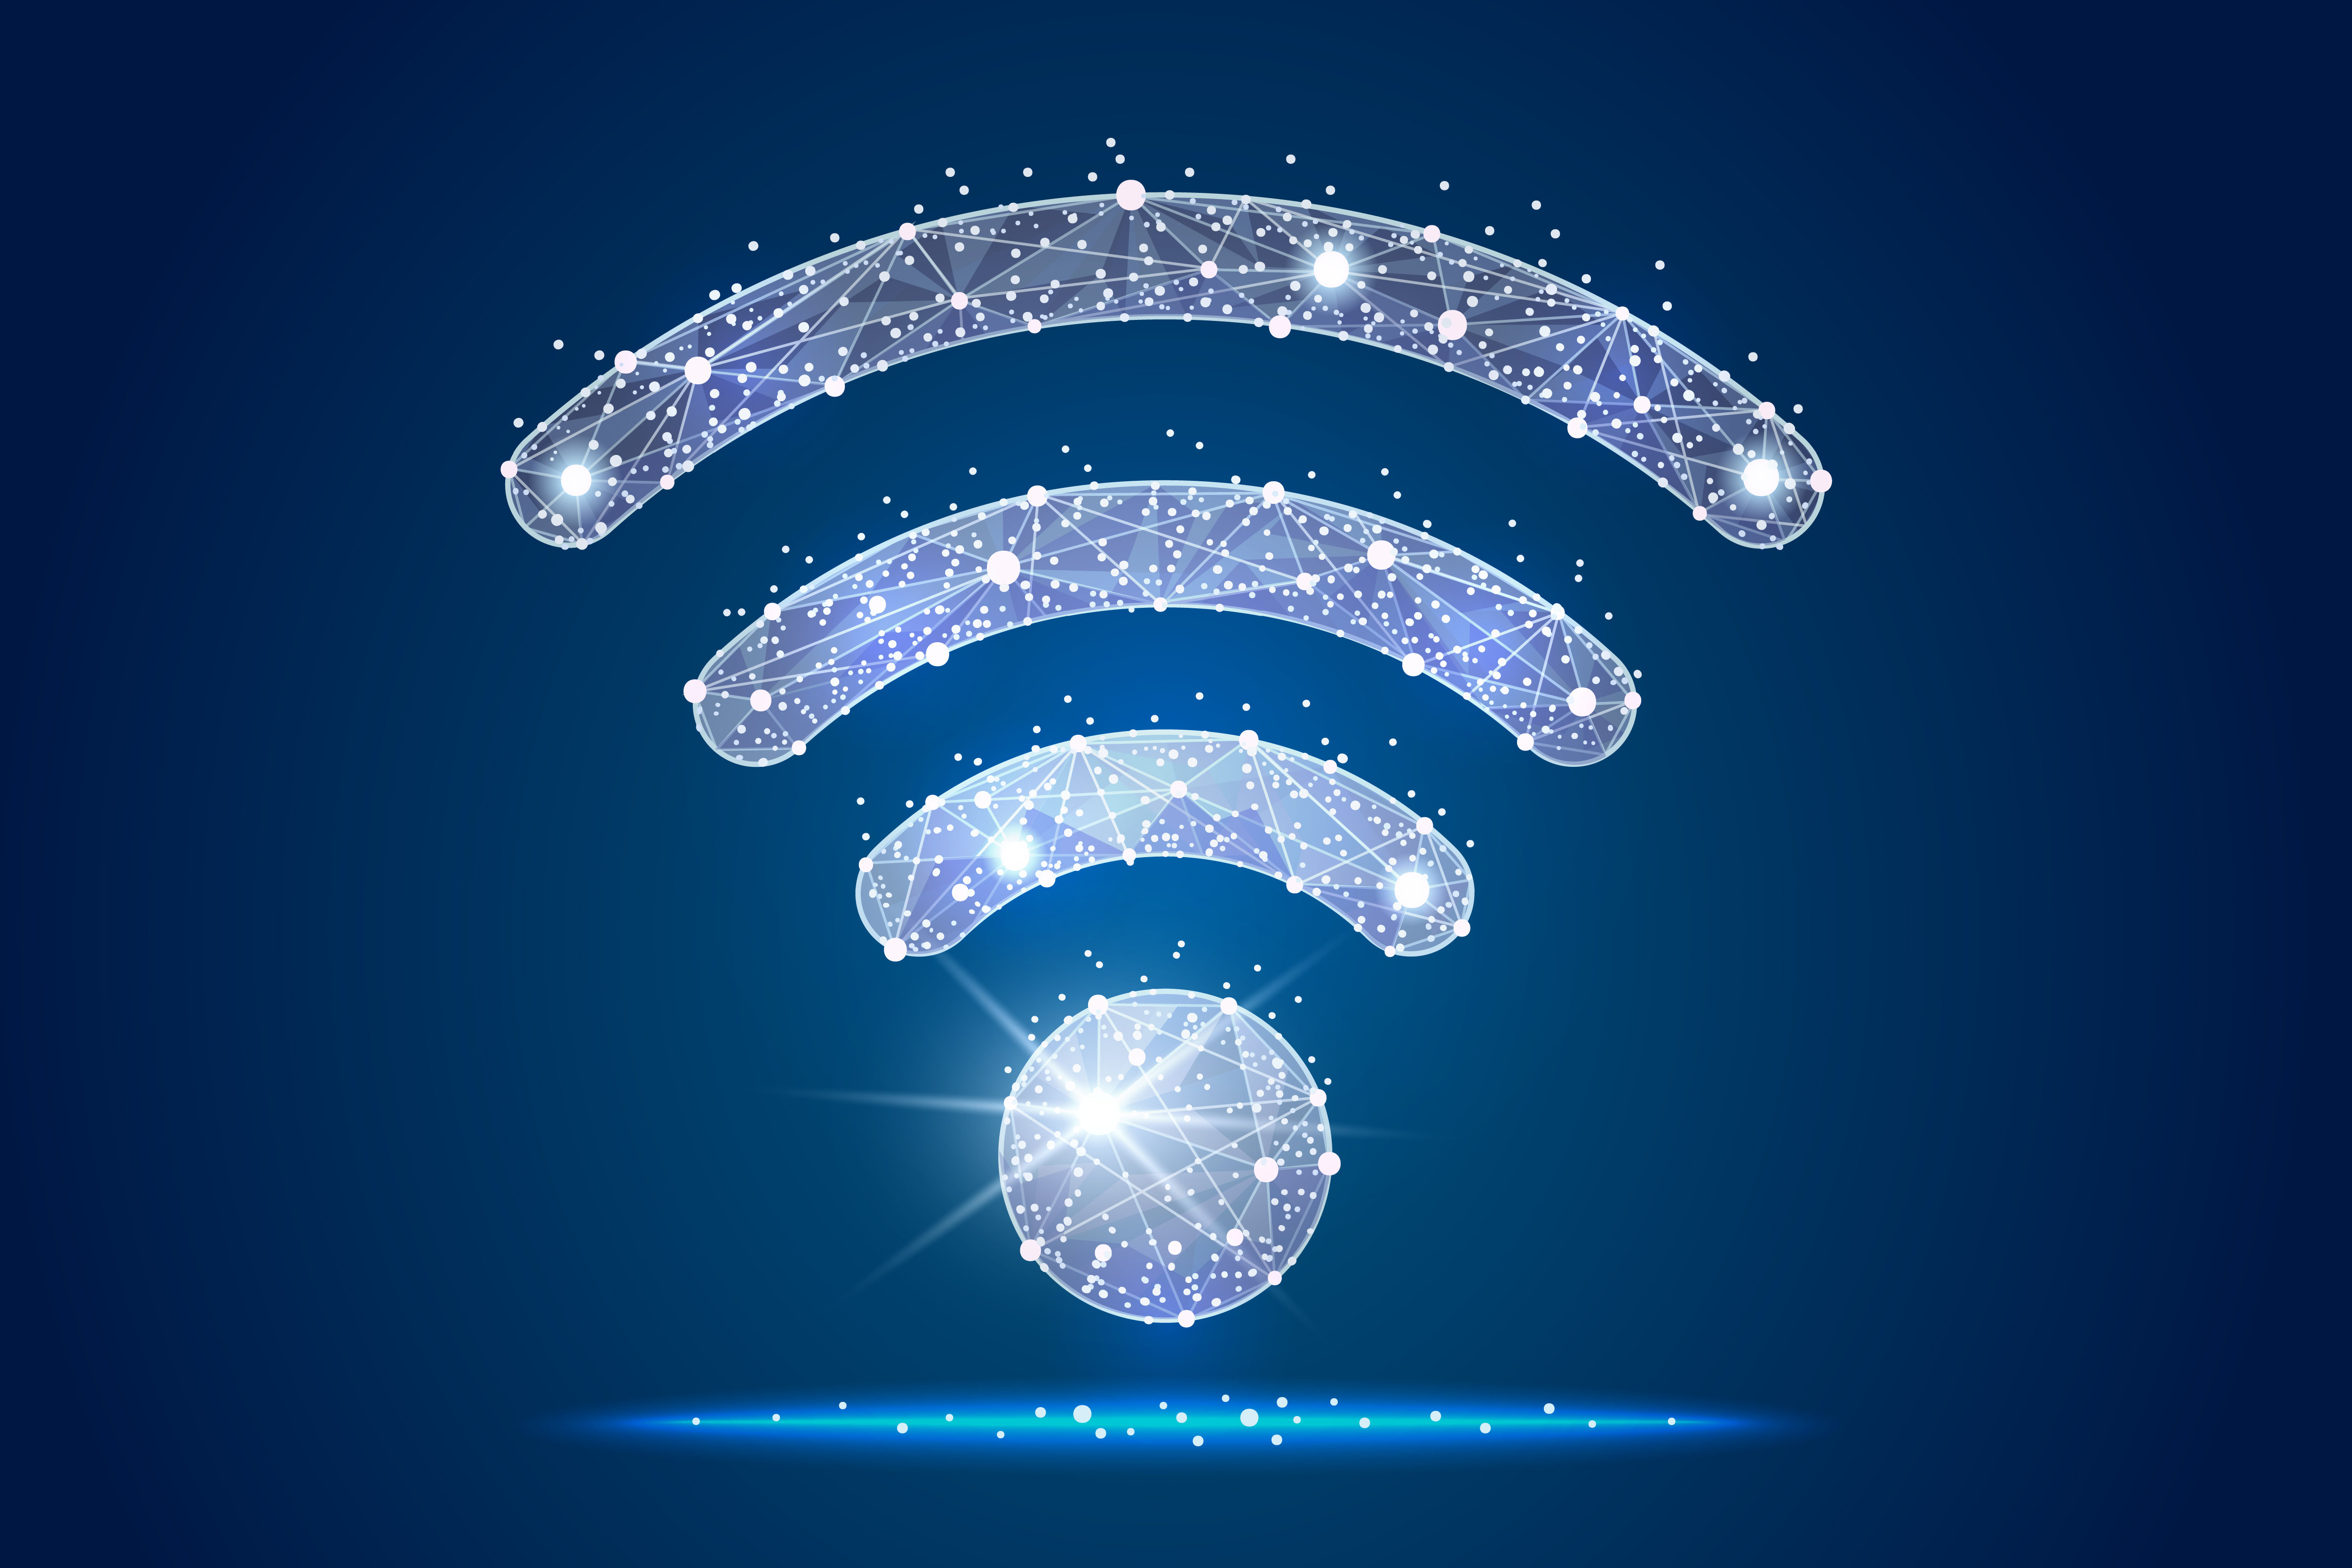 Cambium embraces 60 GHz, Wi-Fi 6 for multi-gigabit connectivity